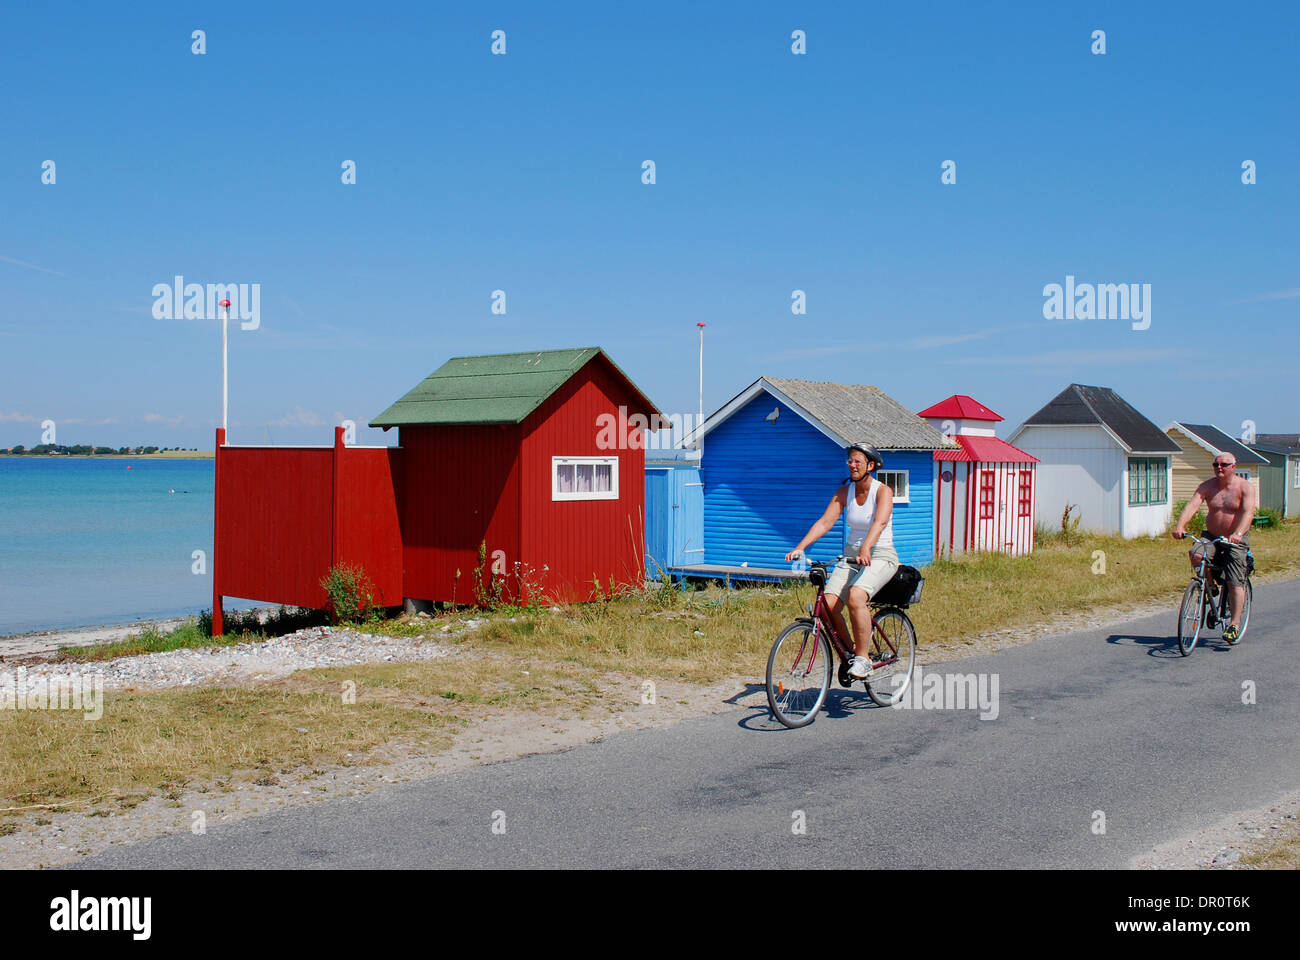 Aero island, beach Huts at Aeroskoebing  Vesterstrand, fyn, Denmark, Scandinavia, Europe - Stock Image